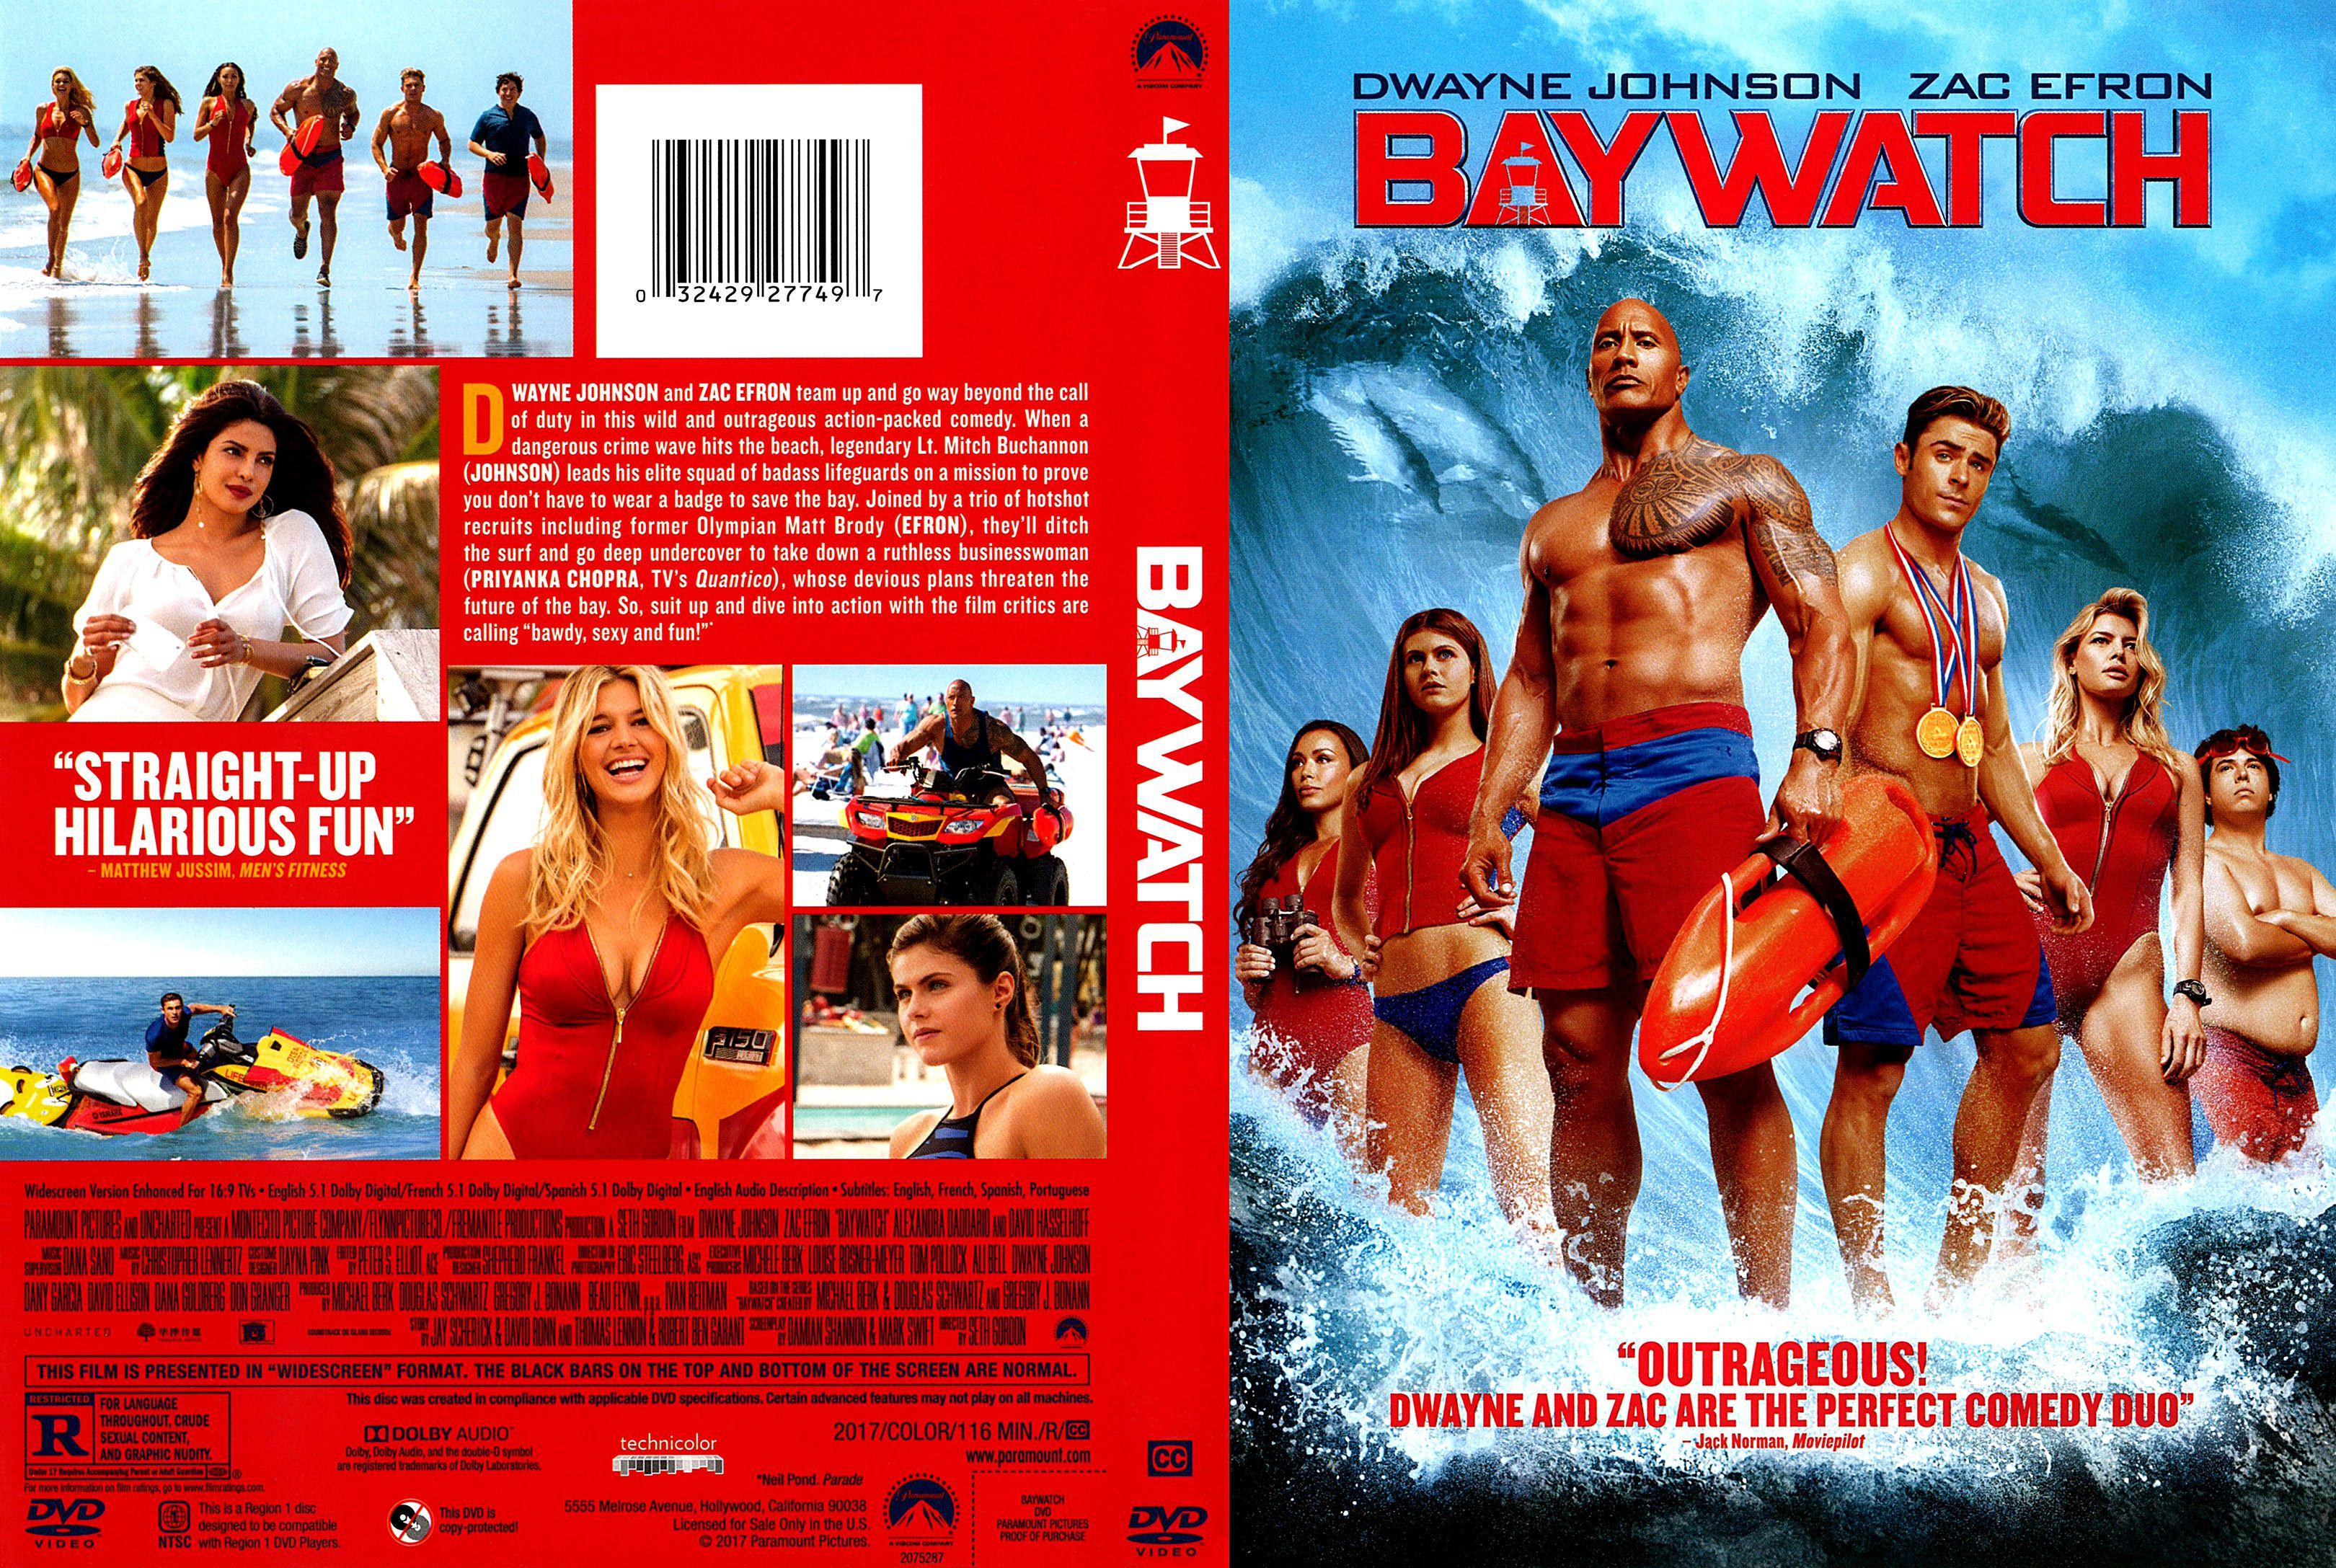 baywatch film - photo #17